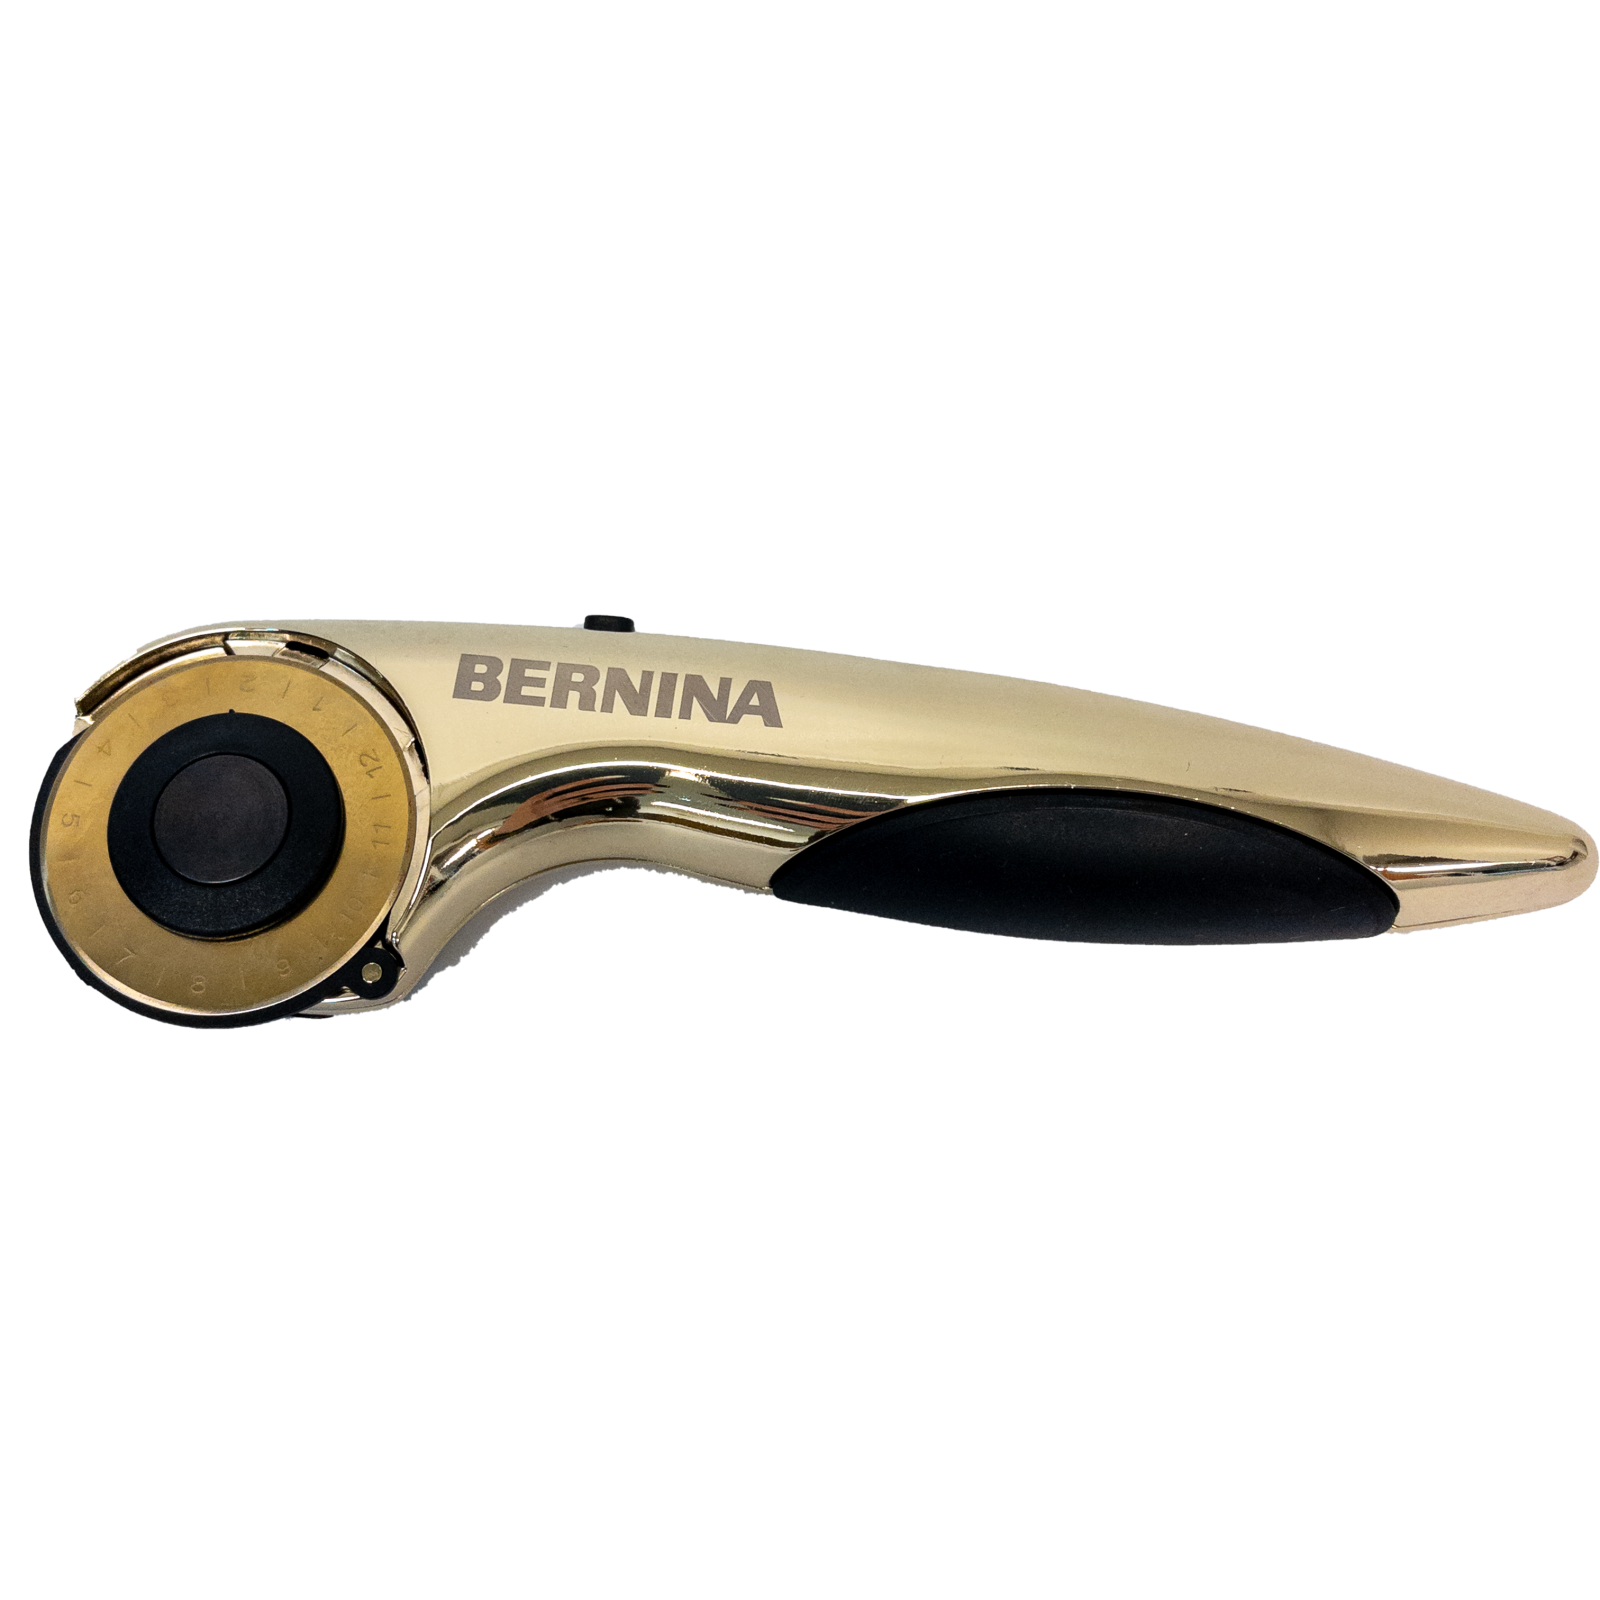 Bernina 45mm Rotary Cutter 125th Anniversary